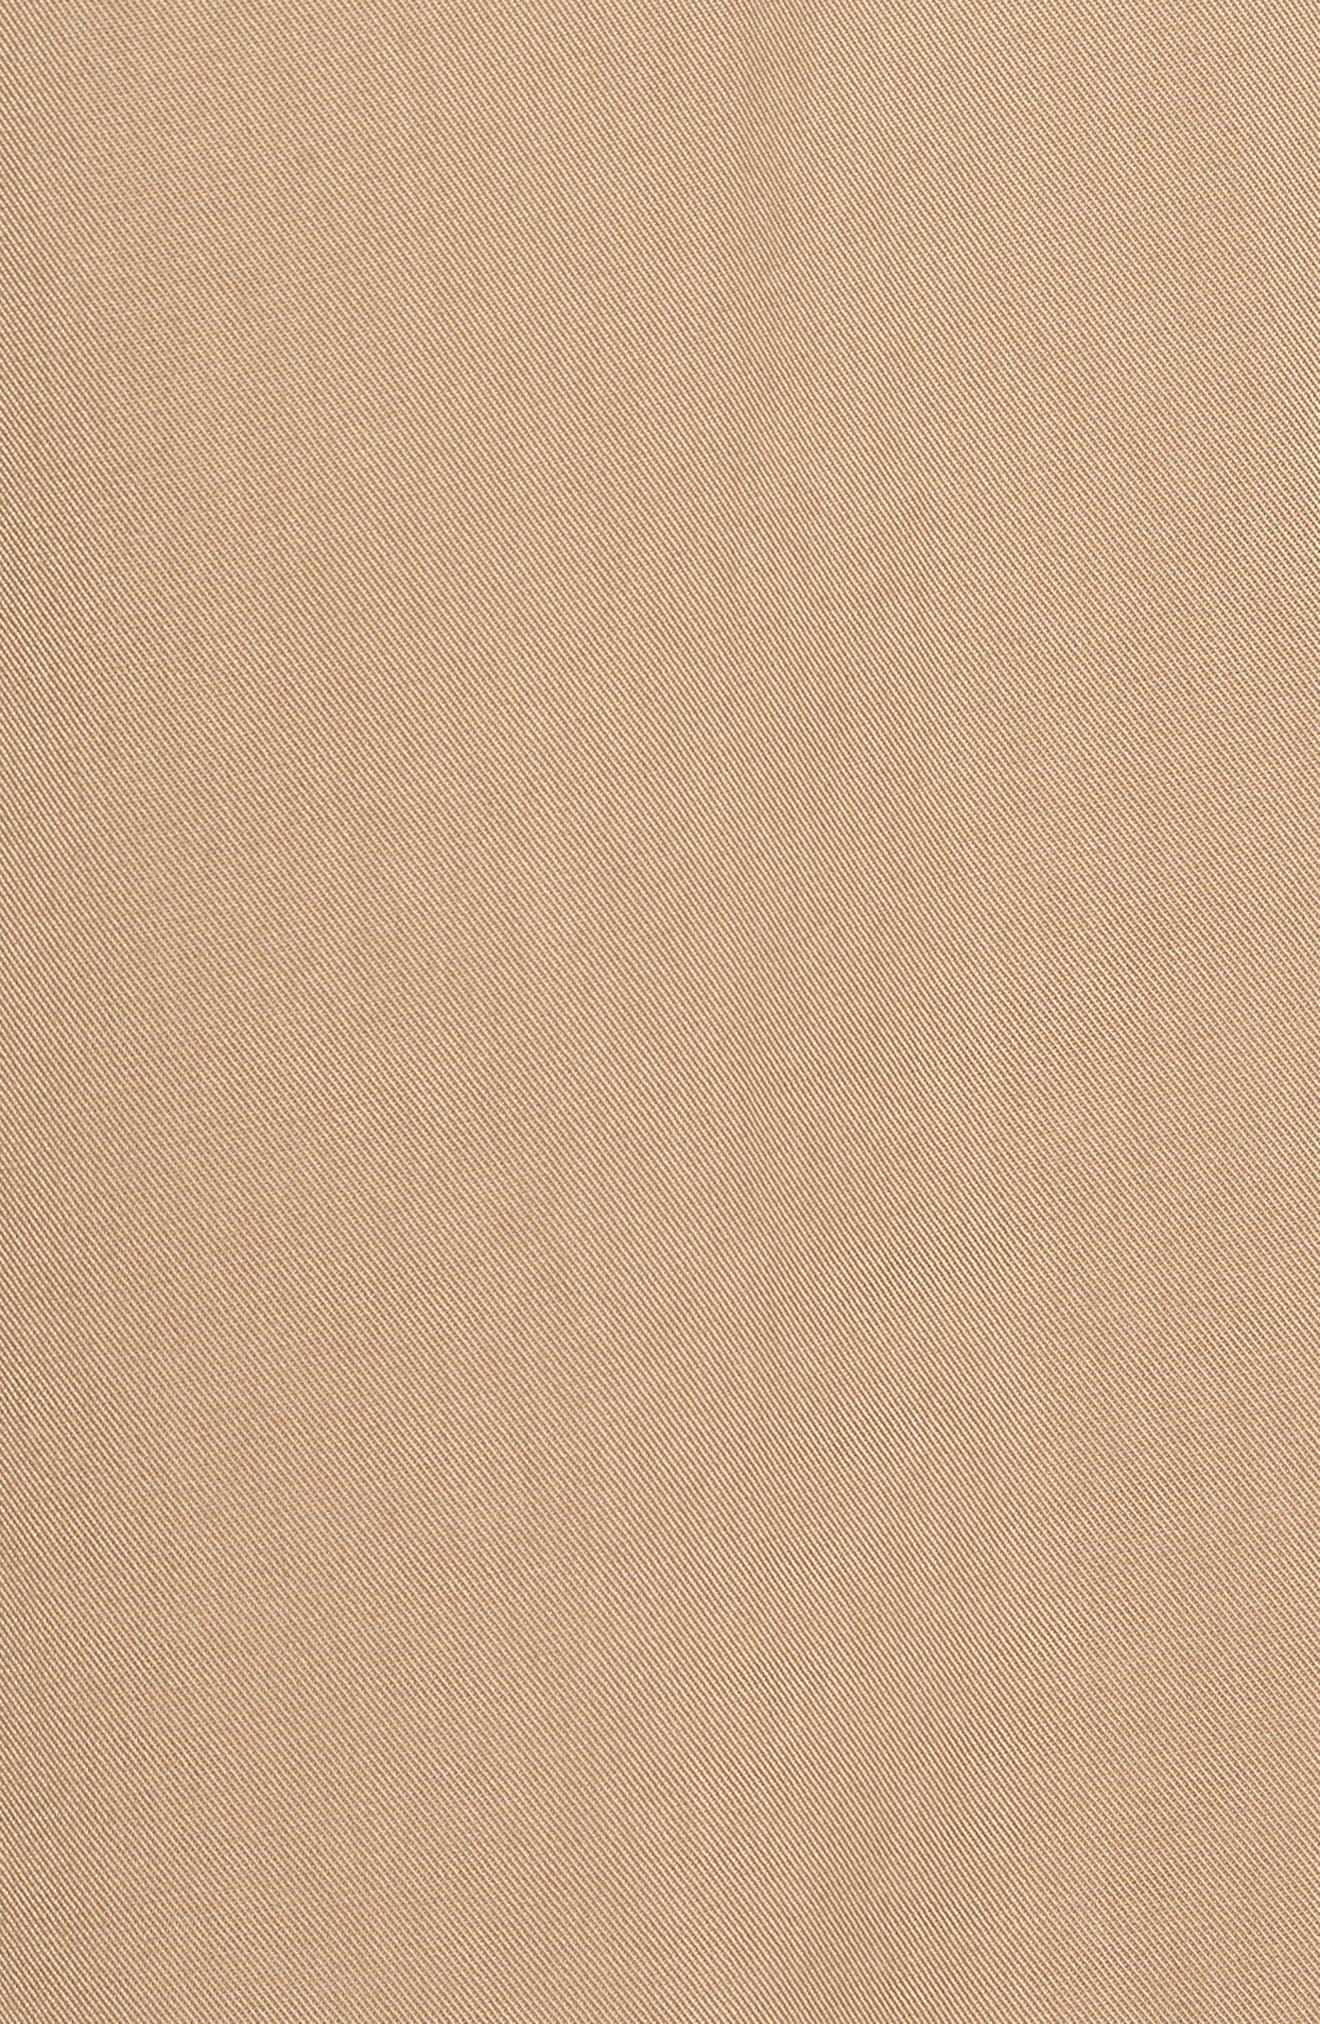 Tie Front Culottes,                             Alternate thumbnail 5, color,                             250